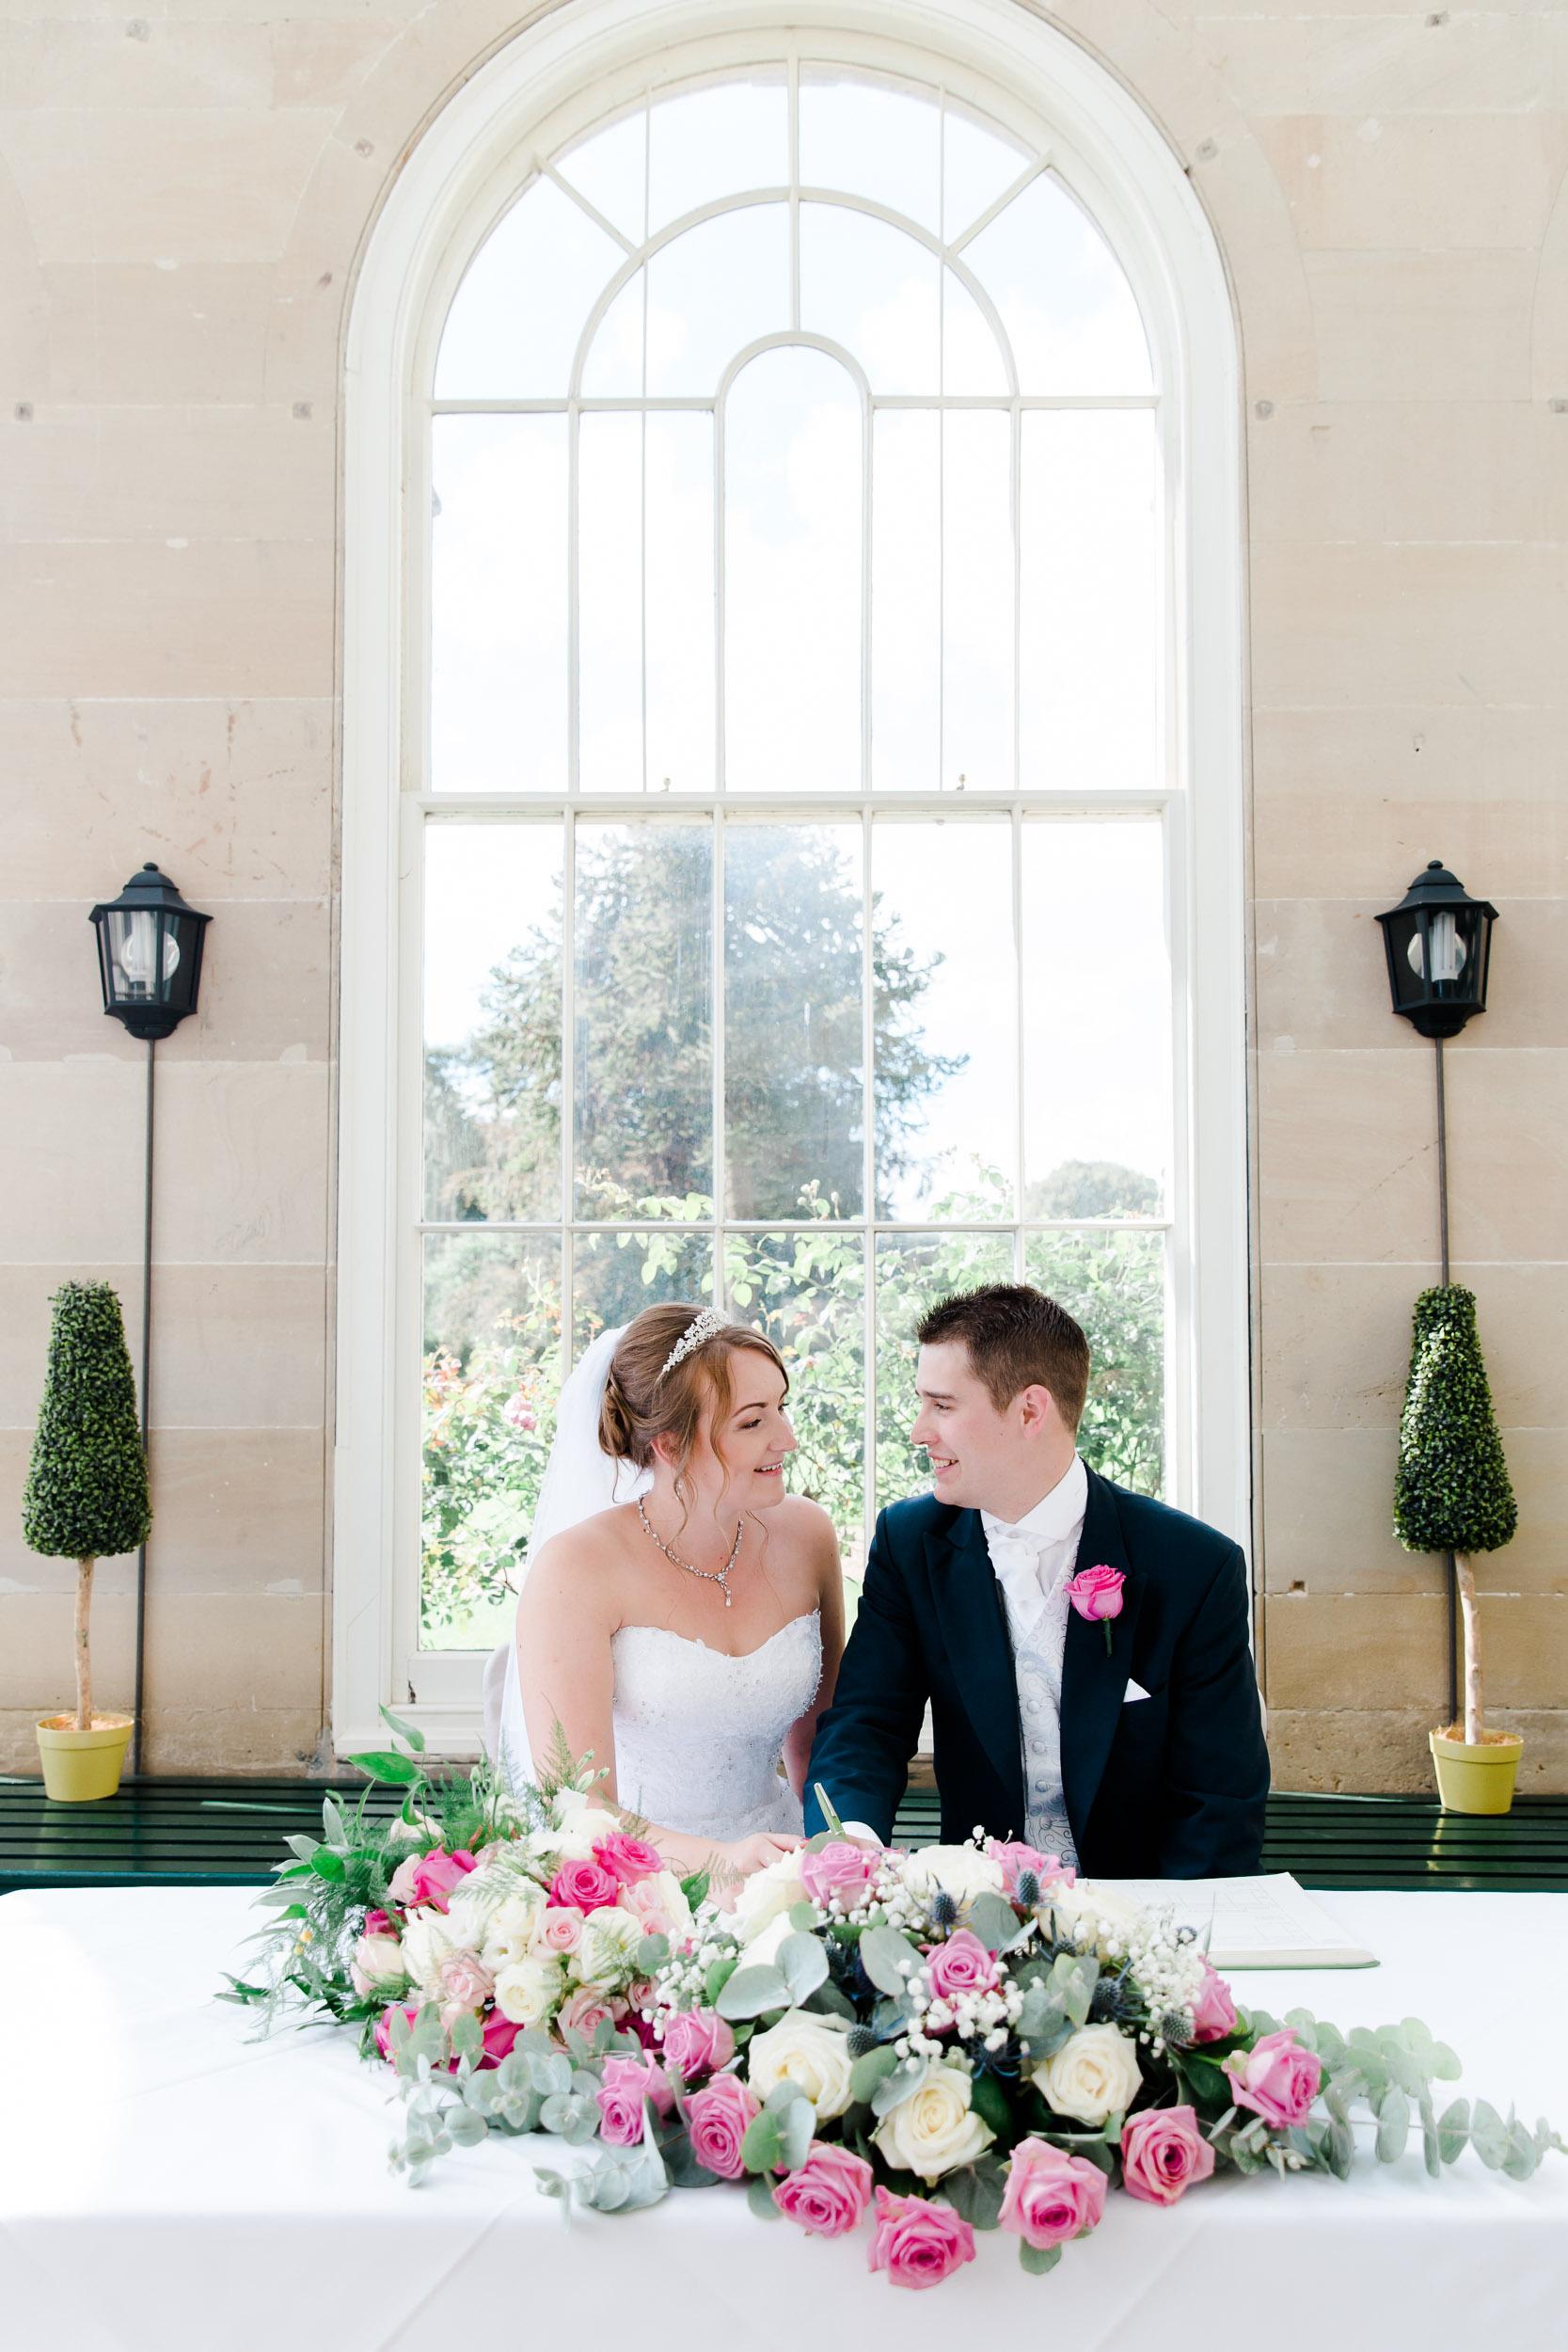 stoneleigh-abbey-wedding-photography-46